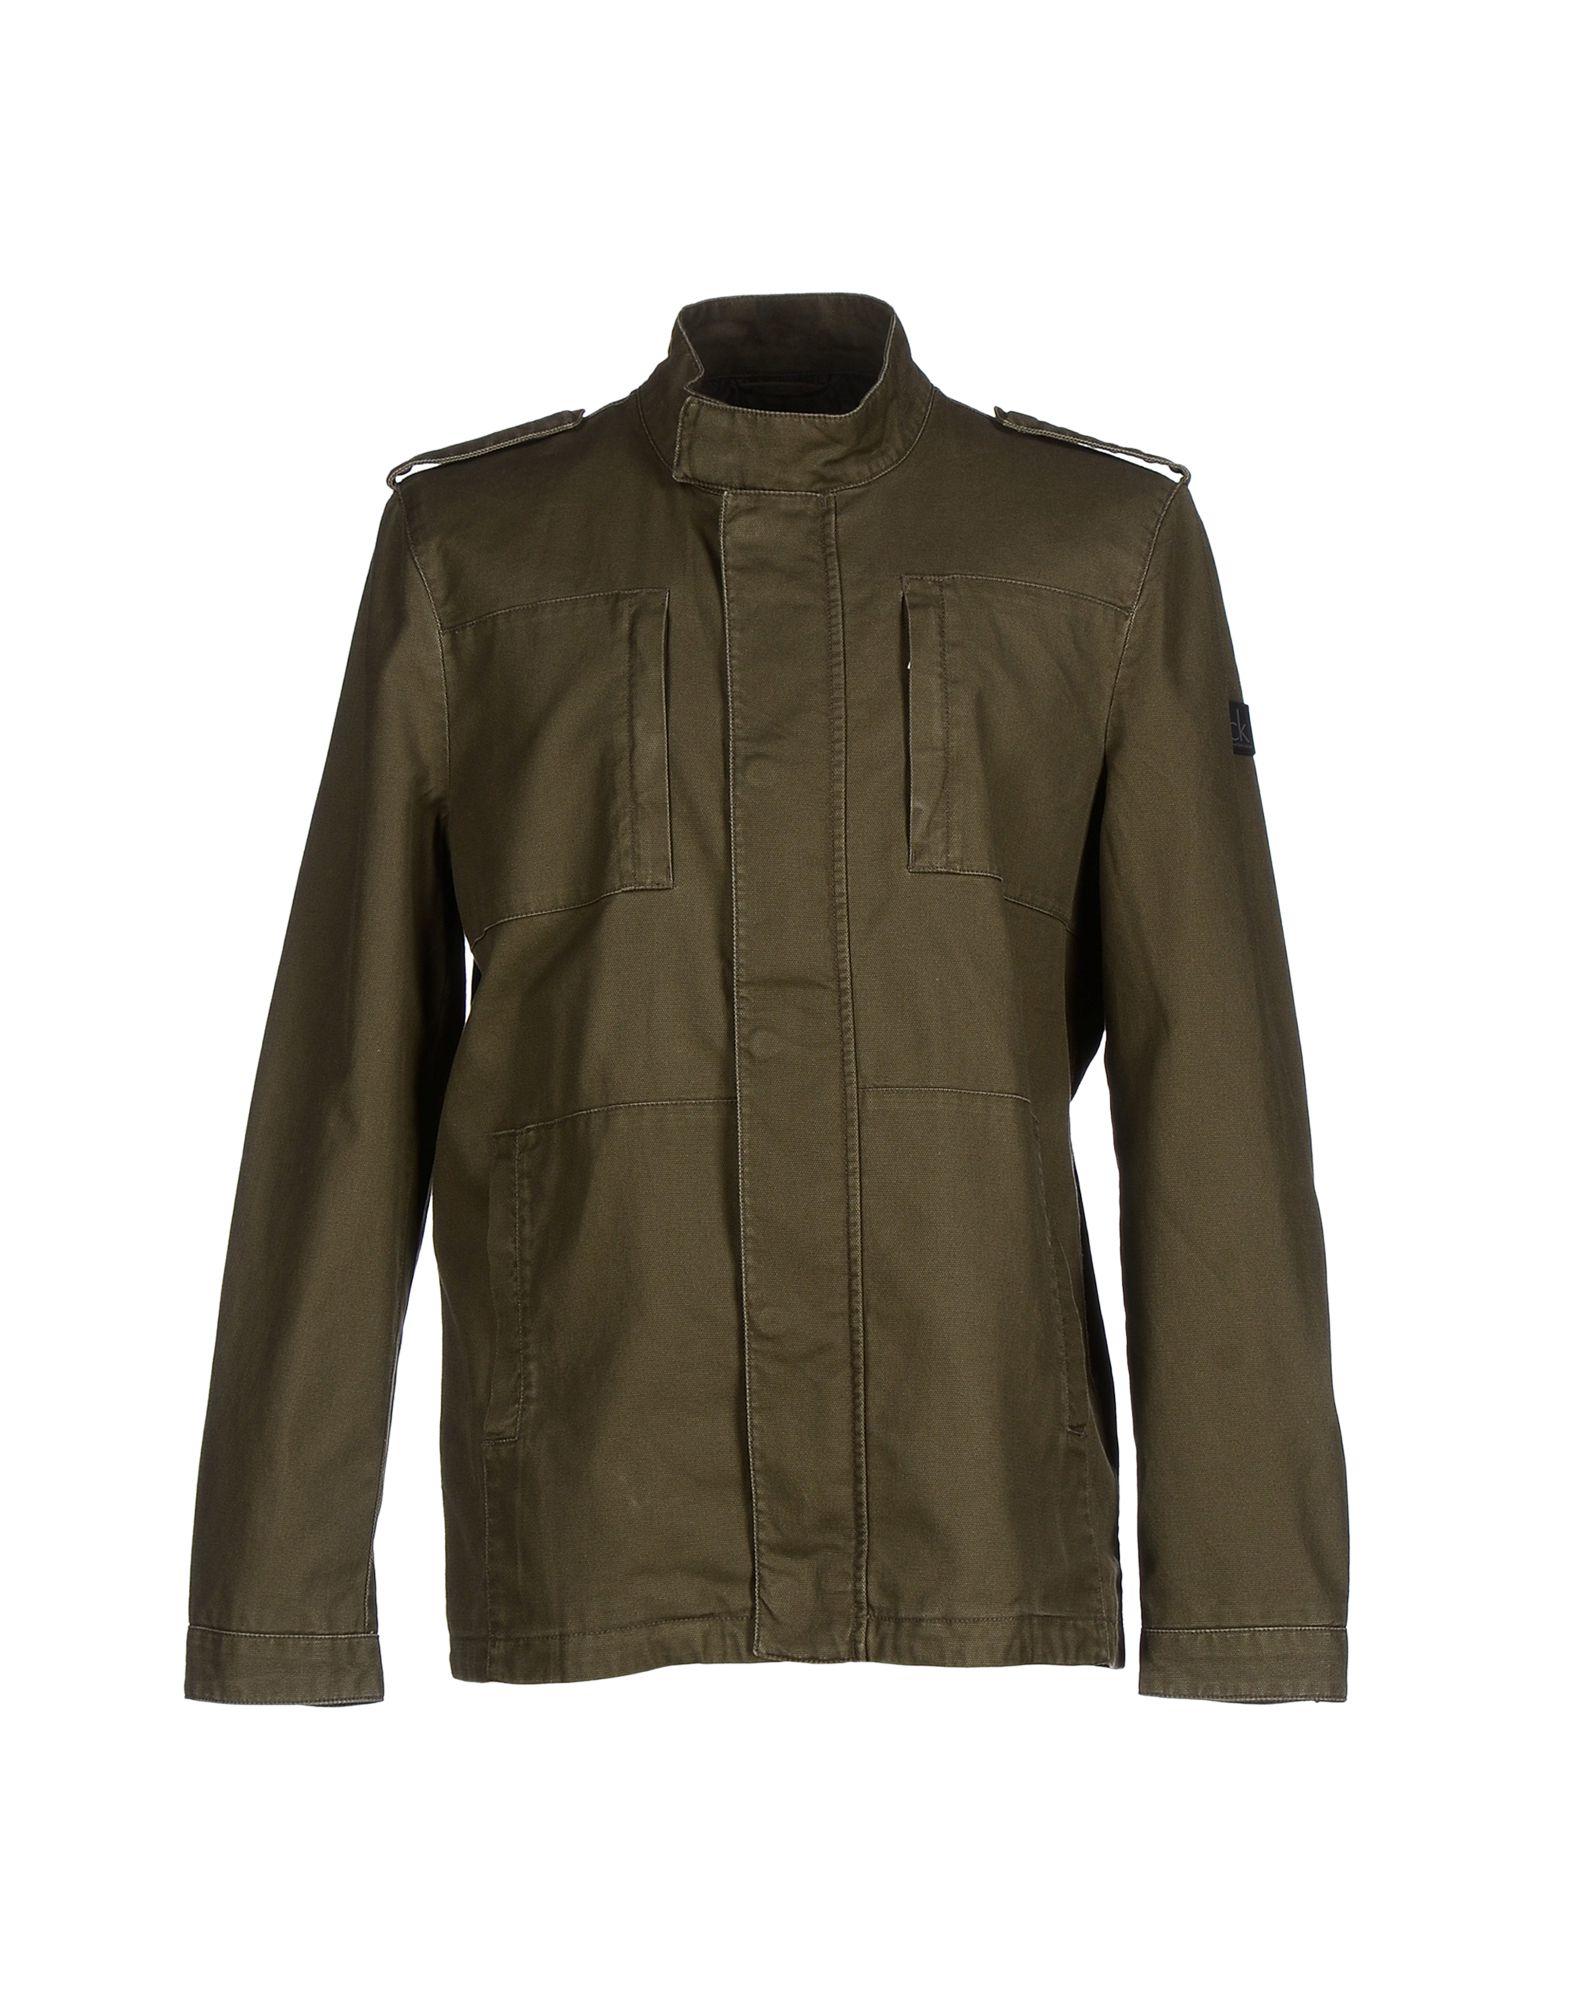 Calvin klein jeans Jacket in Green for Men | Lyst